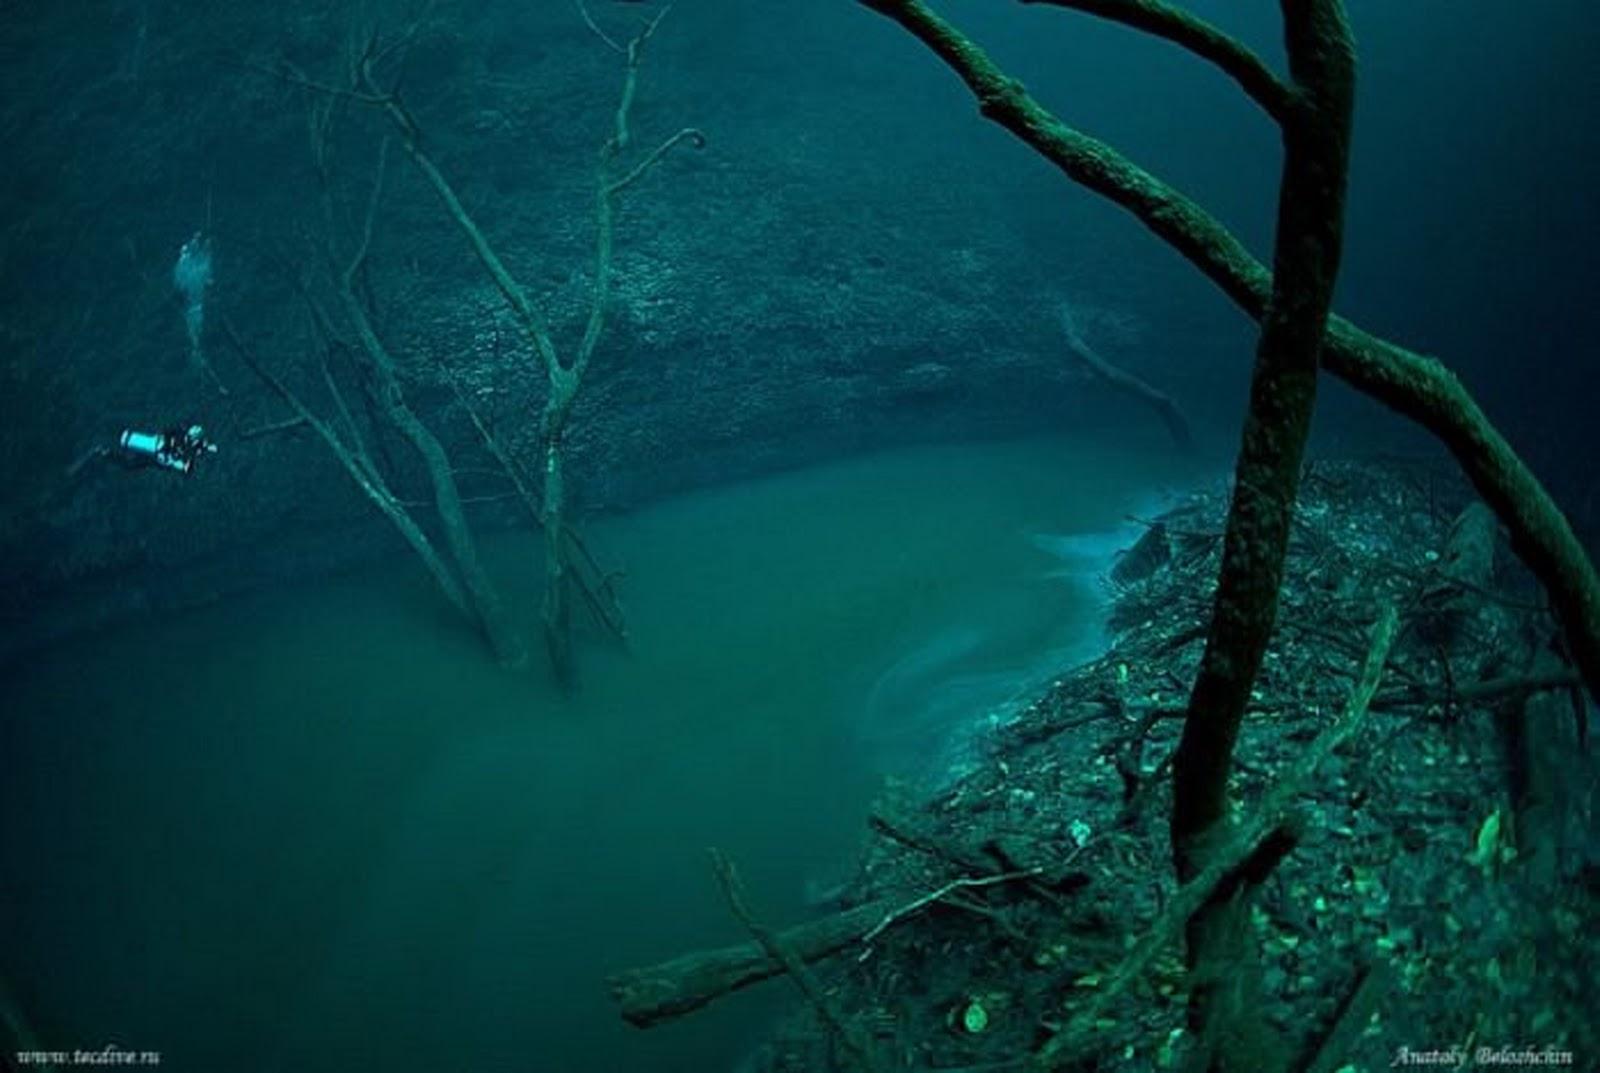 Подводное фото.Глубина съемки 28м.ANGELITA.Мексика.Приехали на восходе,погружаемся.Очень...